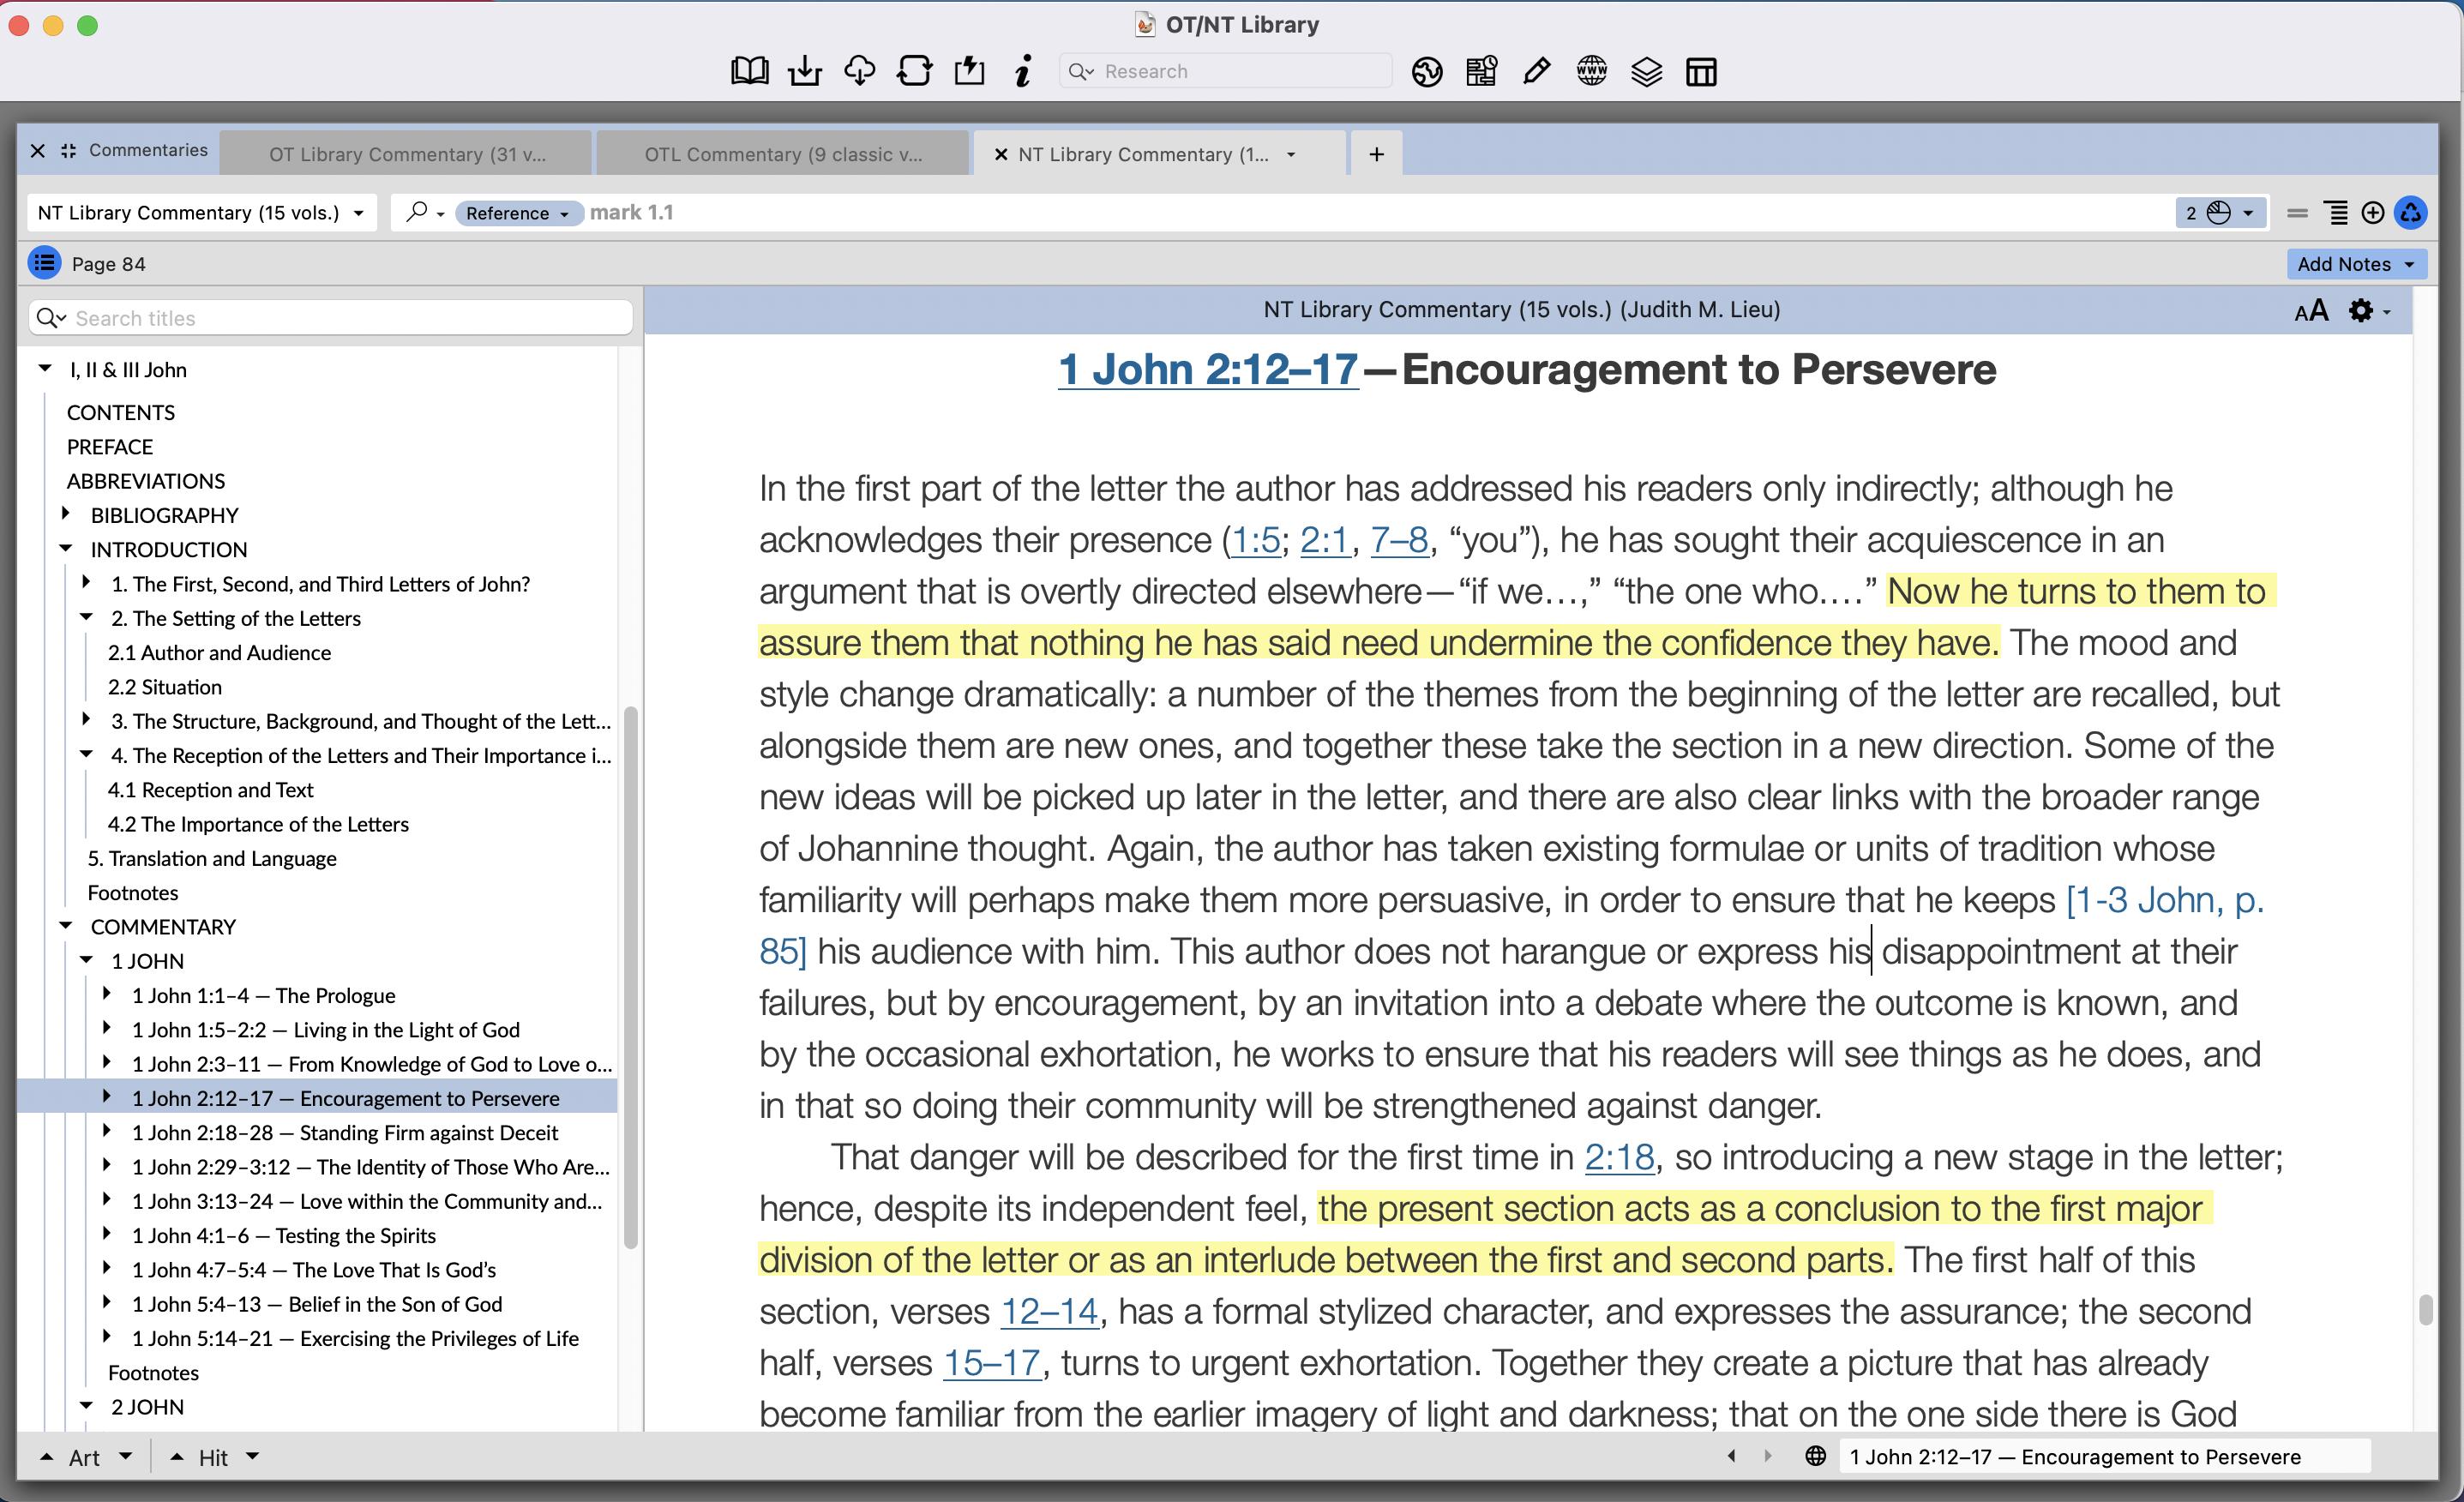 Lieu on 1 John 2:12–17